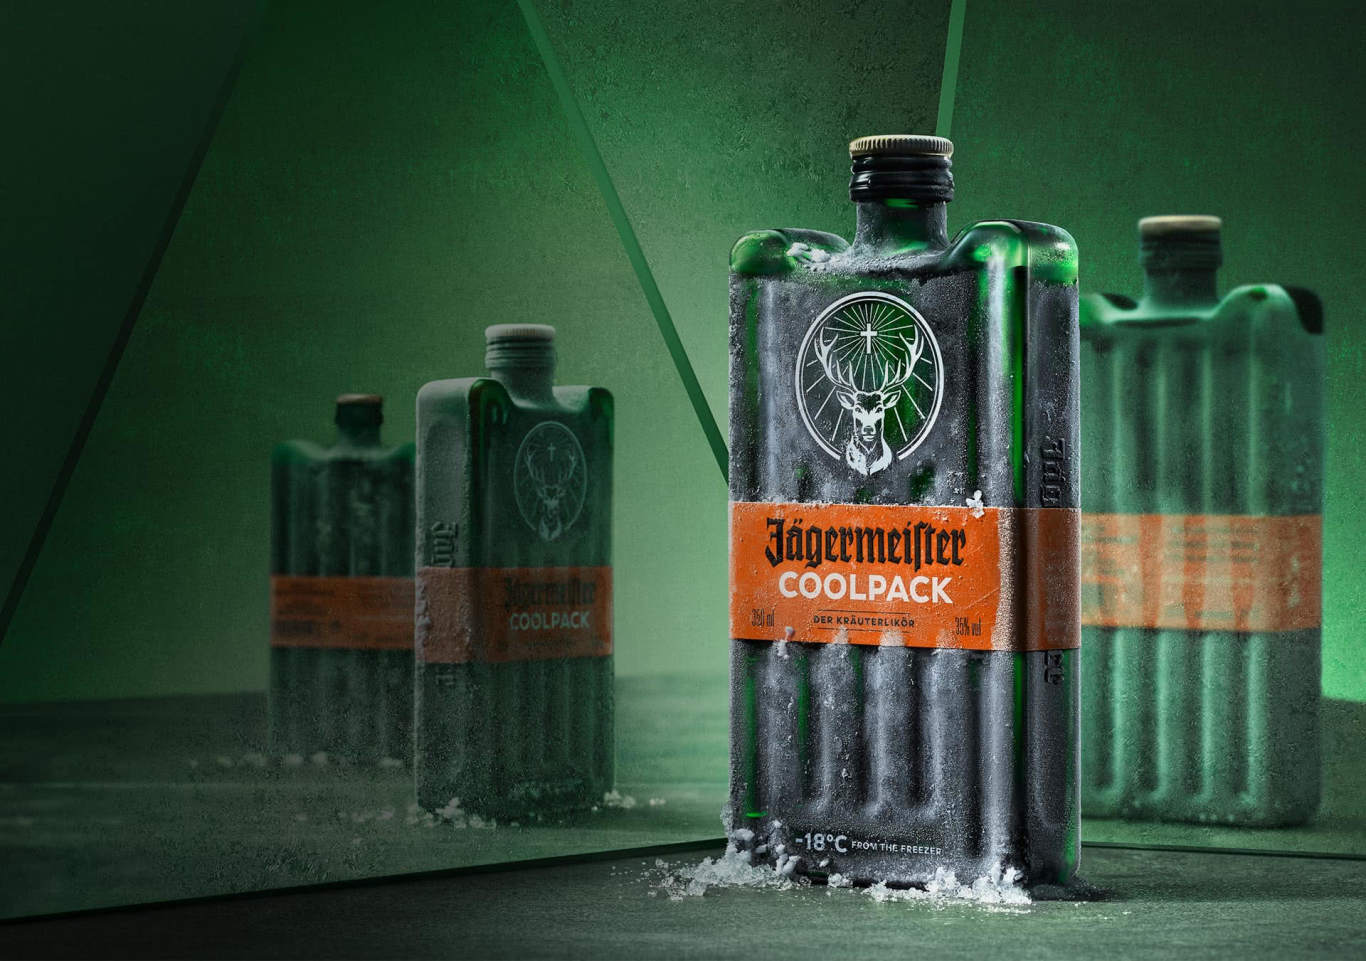 Jägermeister launches ice pack-inspired bottle design photo